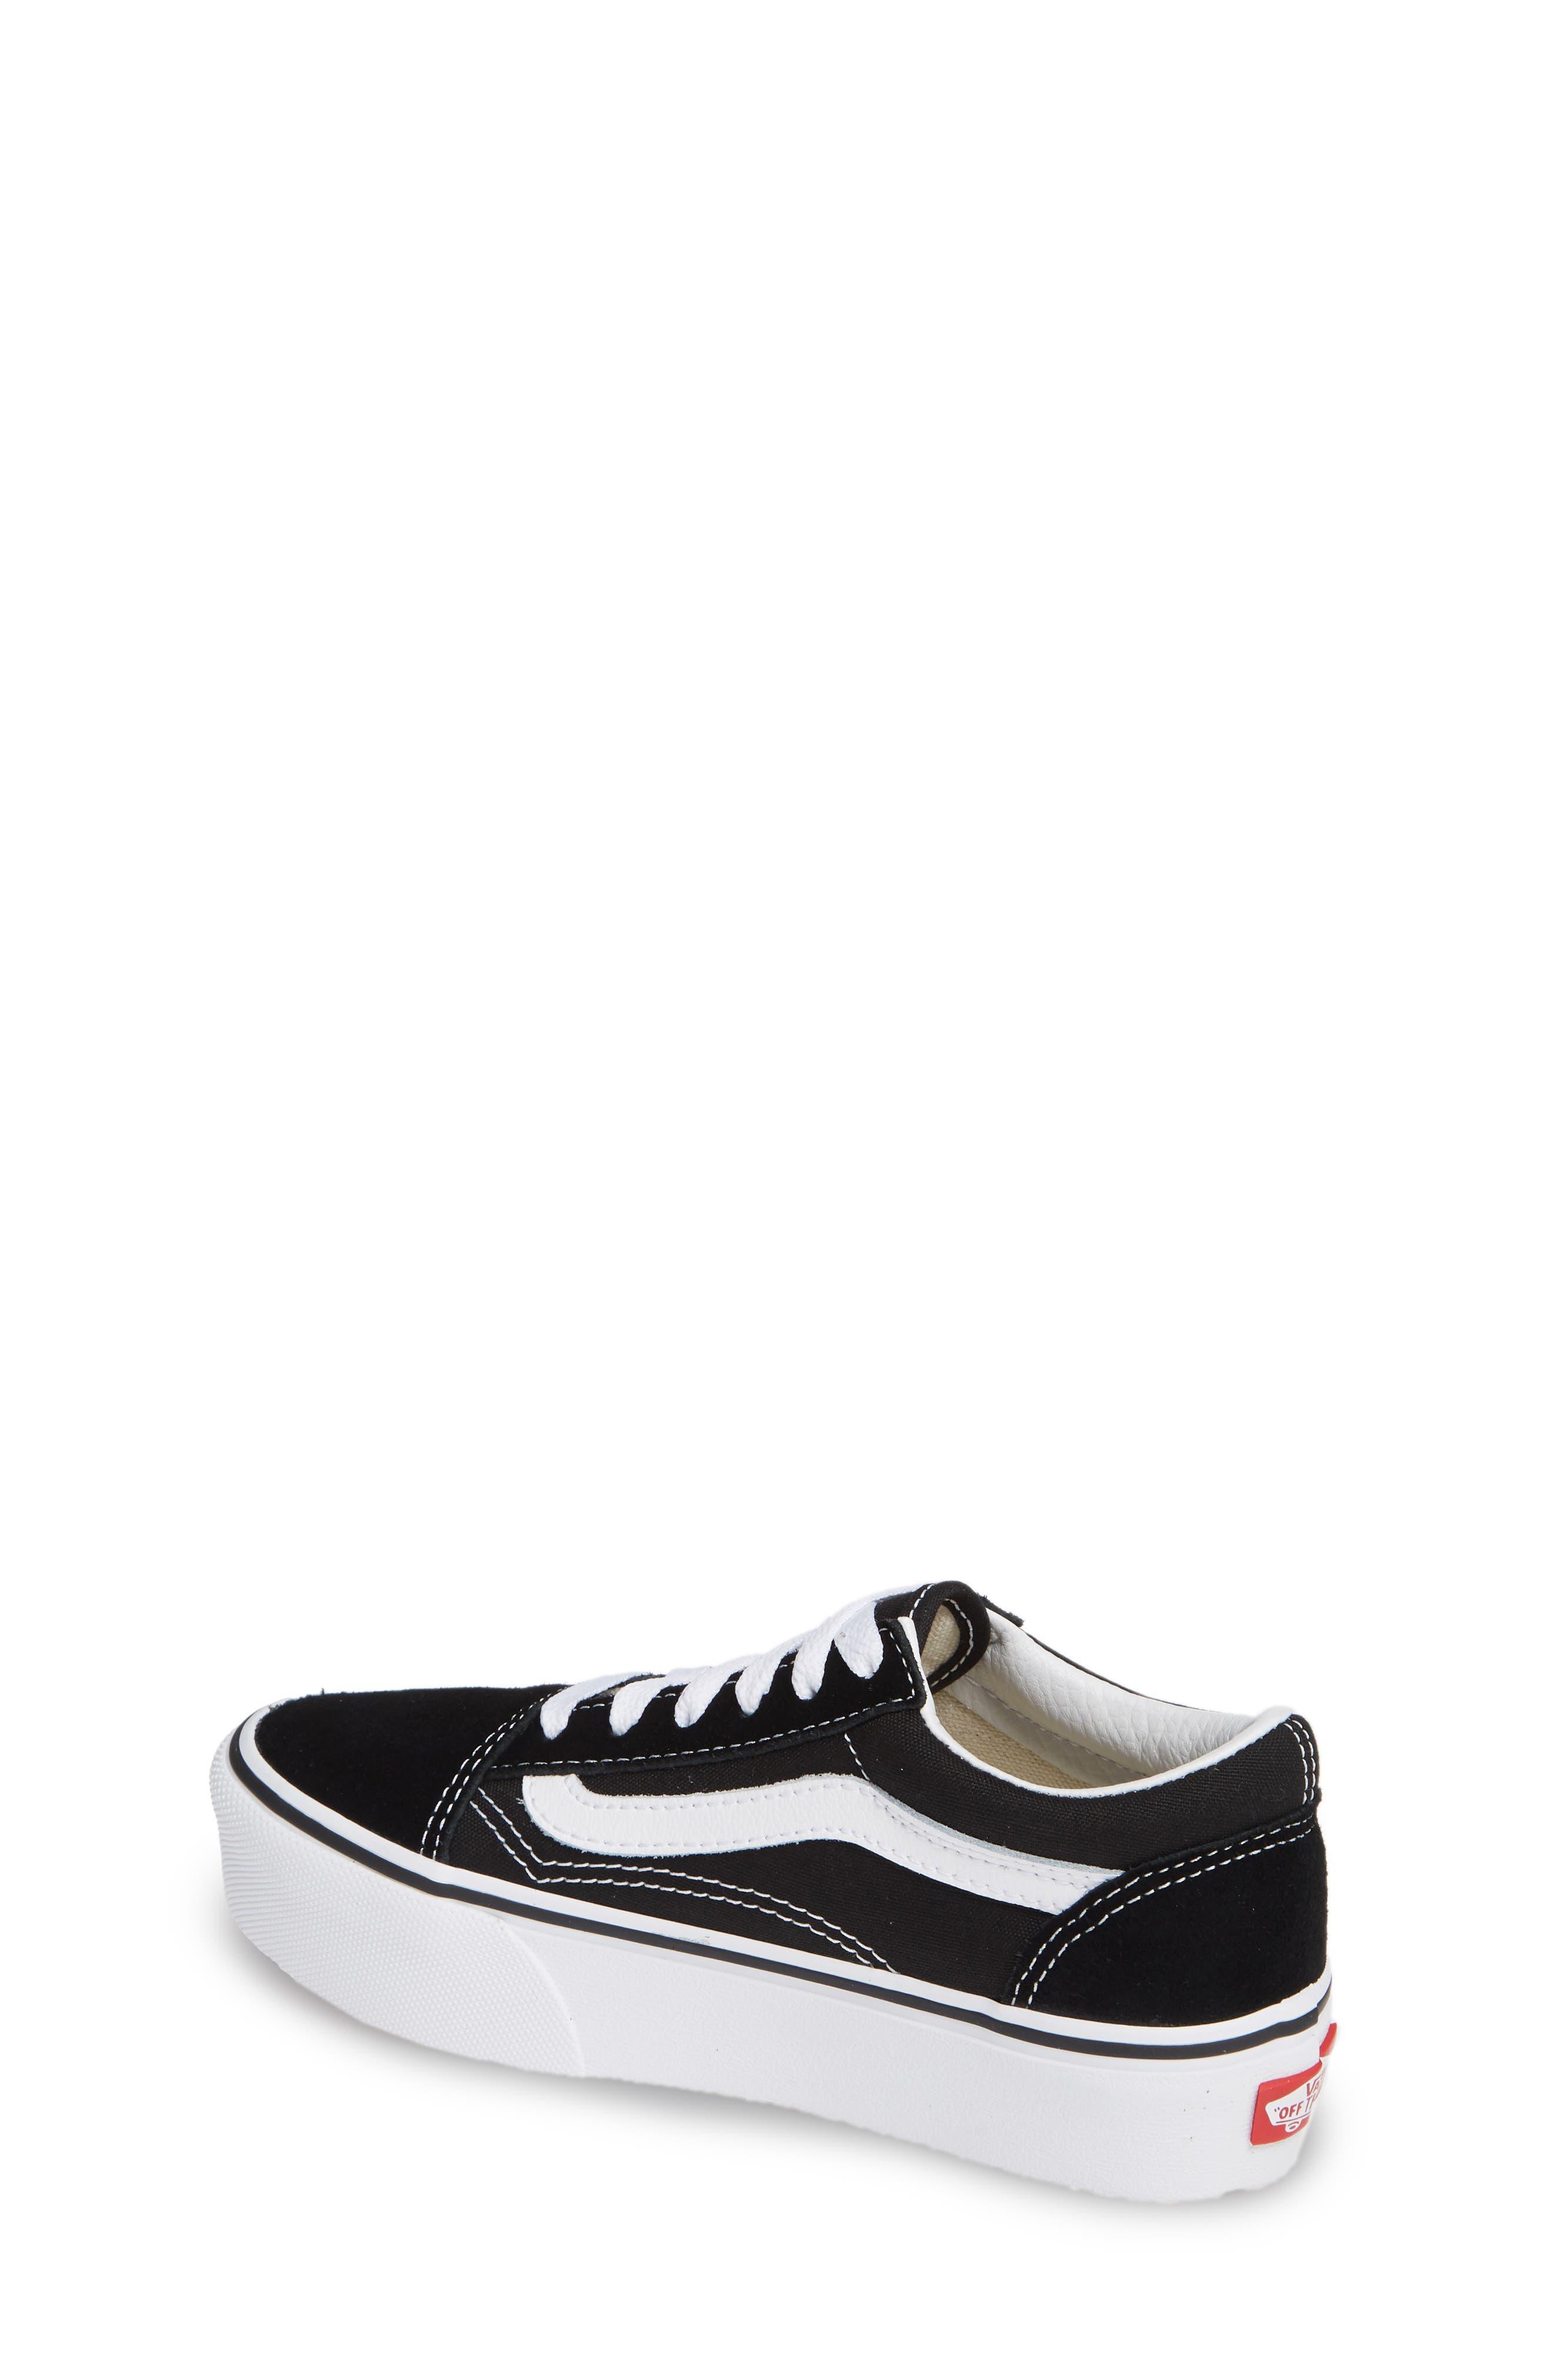 VANS, Old Skool Platform Sneaker, Alternate thumbnail 2, color, BLACK/ TRUE WHITE